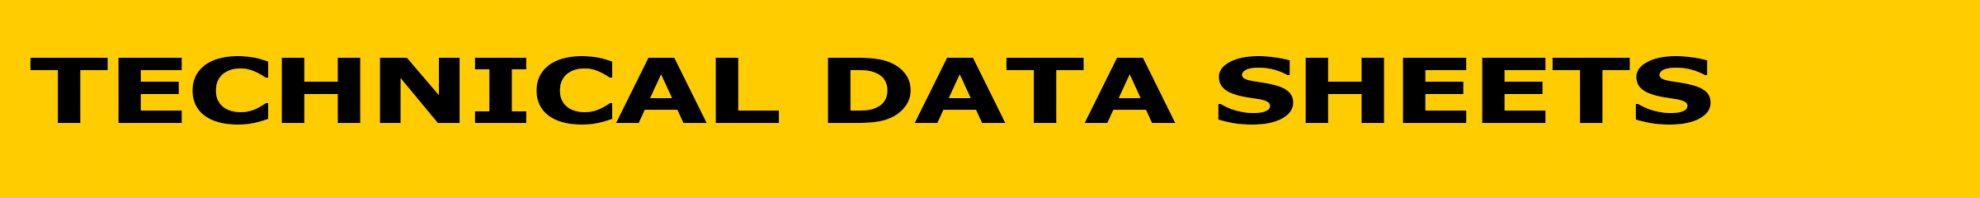 TECHNICAL DATA SHEETS